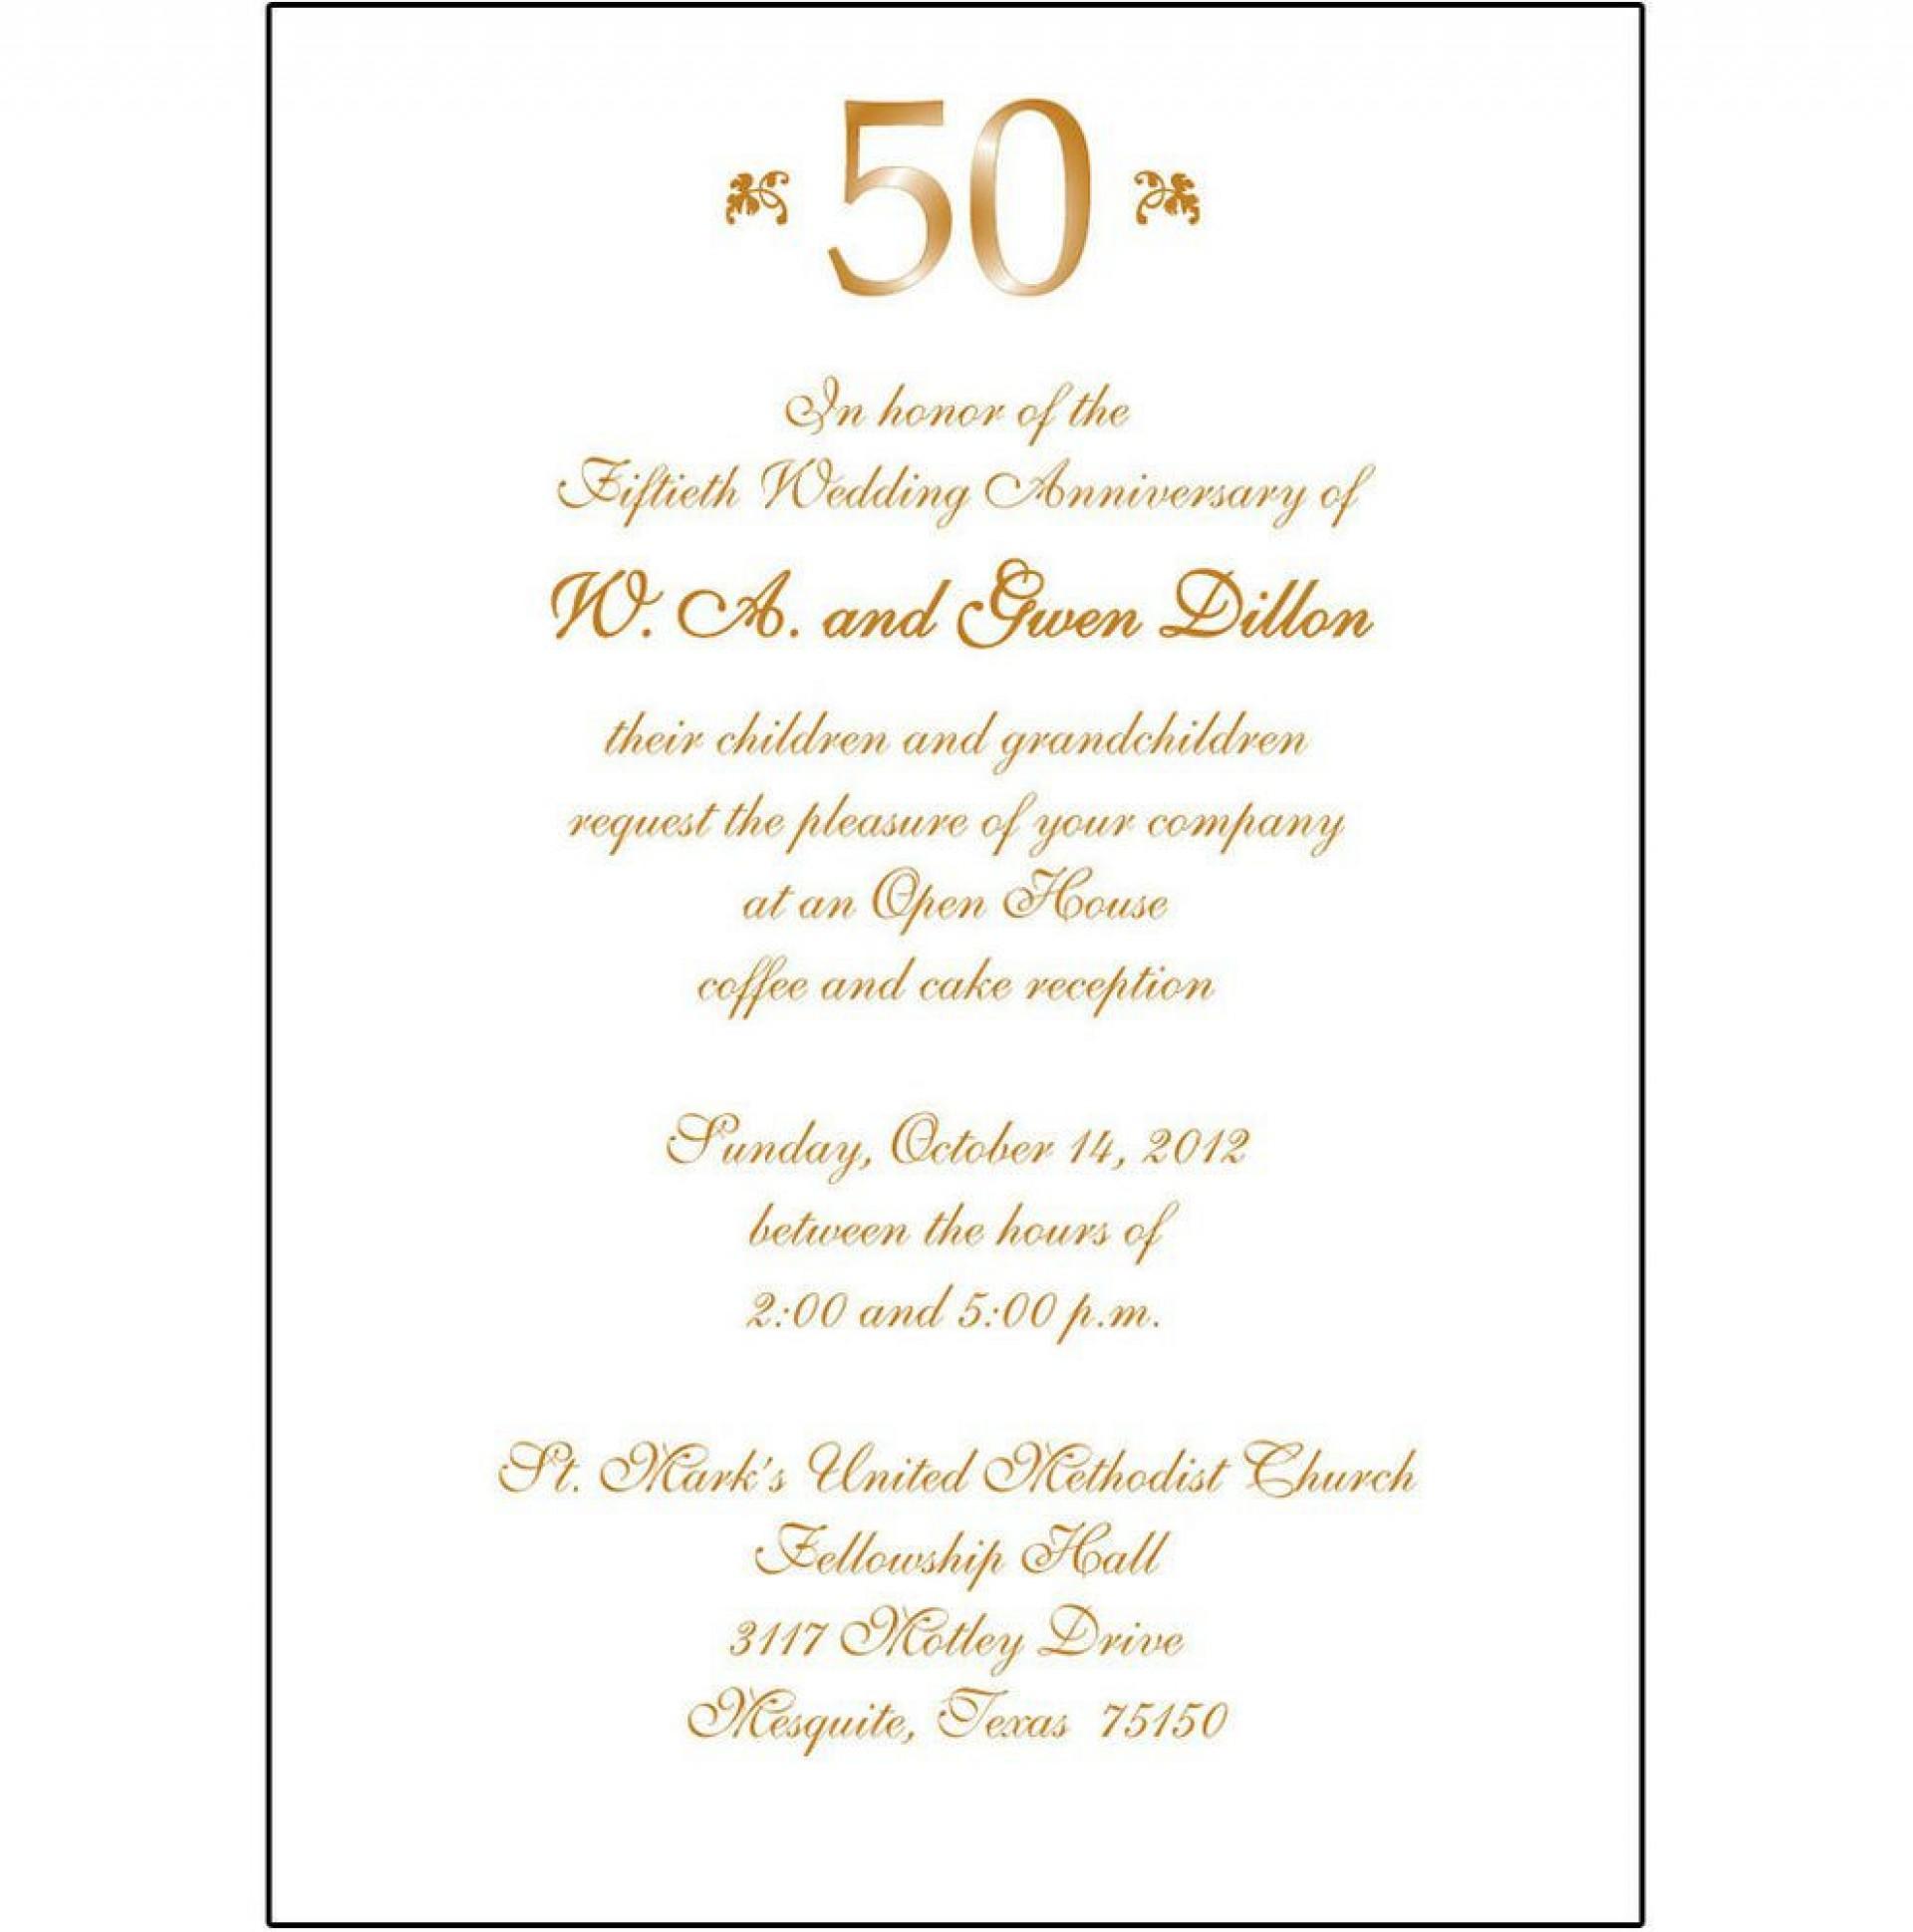 009 Striking 50th Wedding Anniversary Invitation Template Microsoft Word Design  Free1920